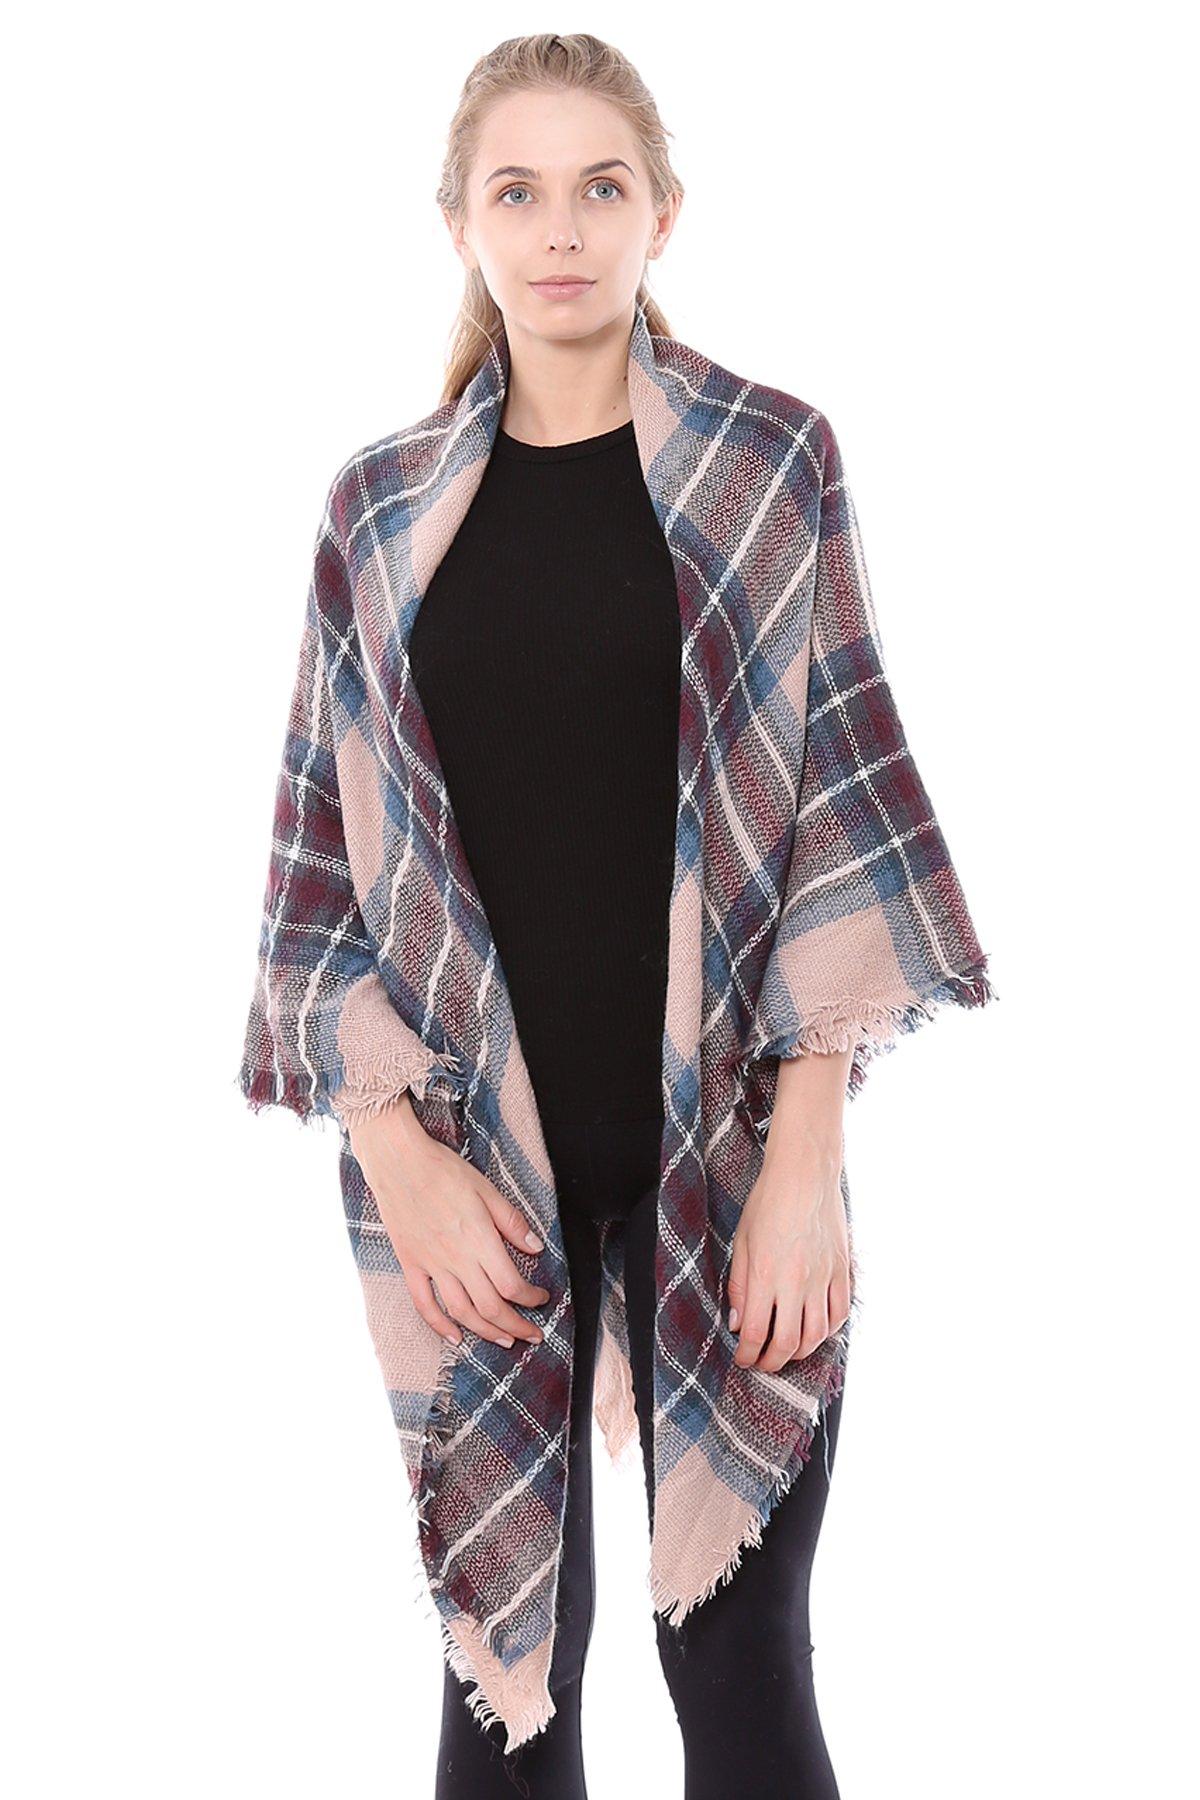 BYOS Women Winter Chic Tartan Plaid Versatile Blanket Scarf Wrap Shawl (Pink Blue)